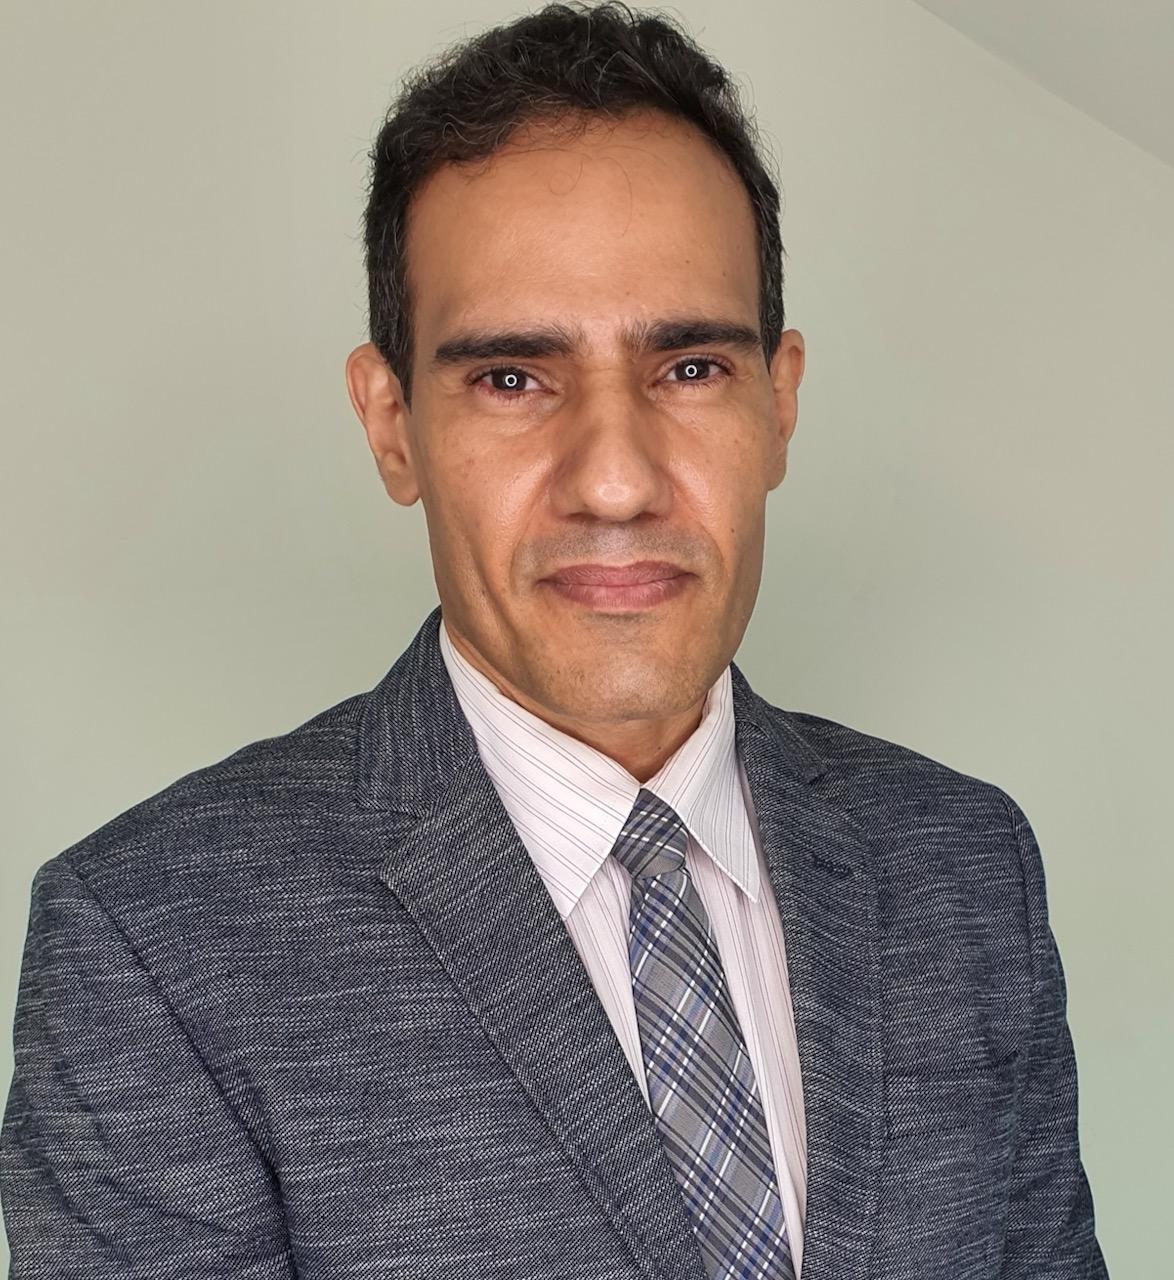 Marcelo Colazingari da Silva